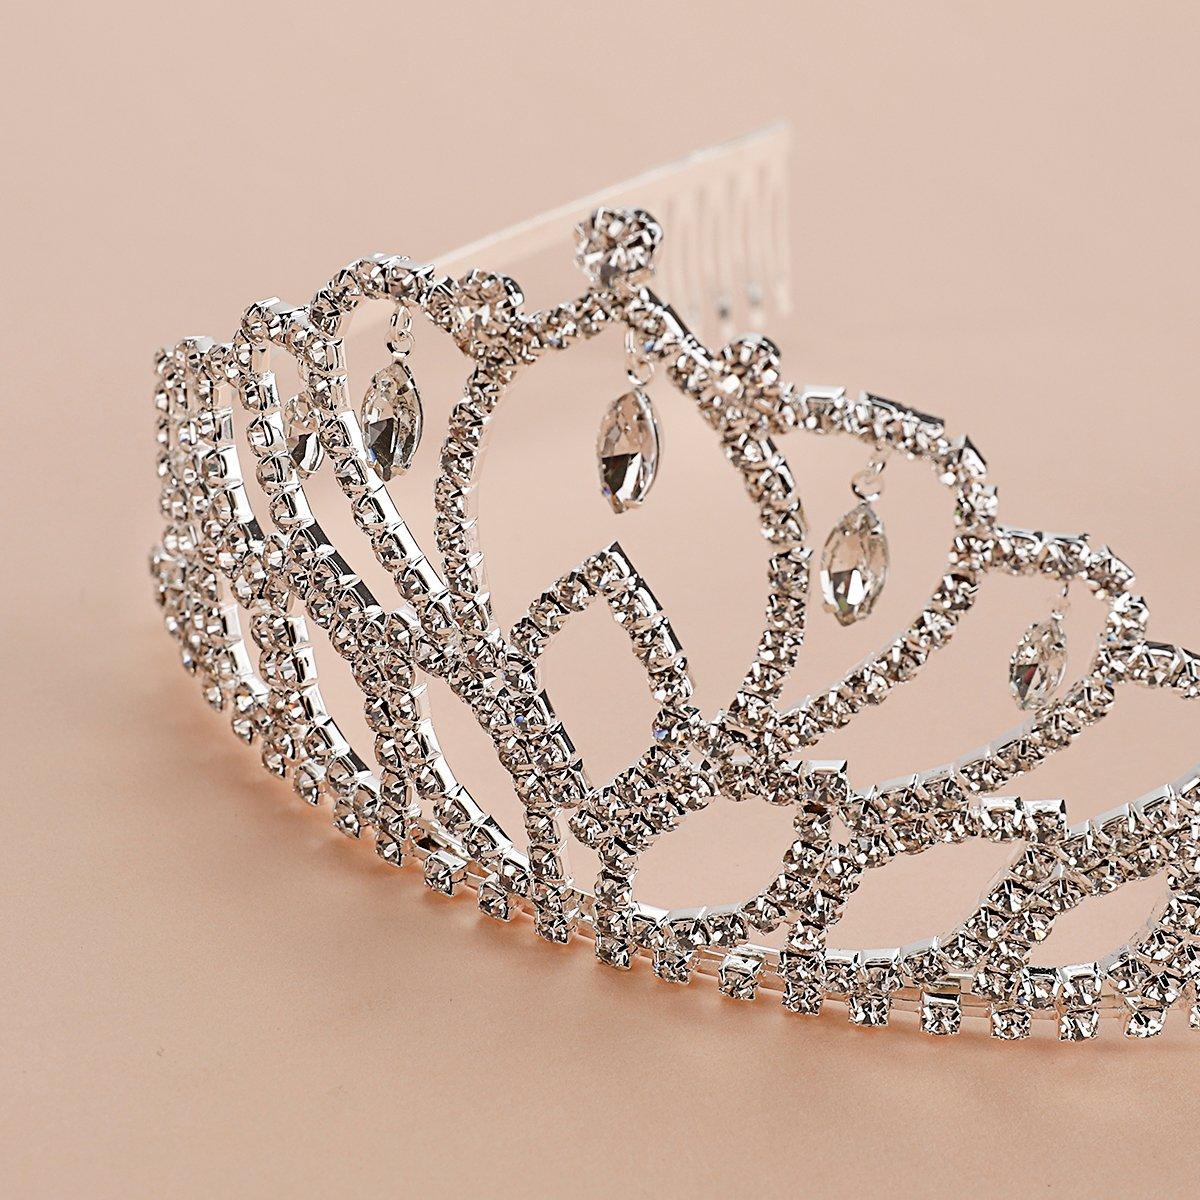 Elegant Tiara Crystal Hair Crown - Rhinestones Headband for Queen, Bridal, Princess in Wedding, Party and Birthday 1-2 - by NIPOO by Nipoo (Image #3)